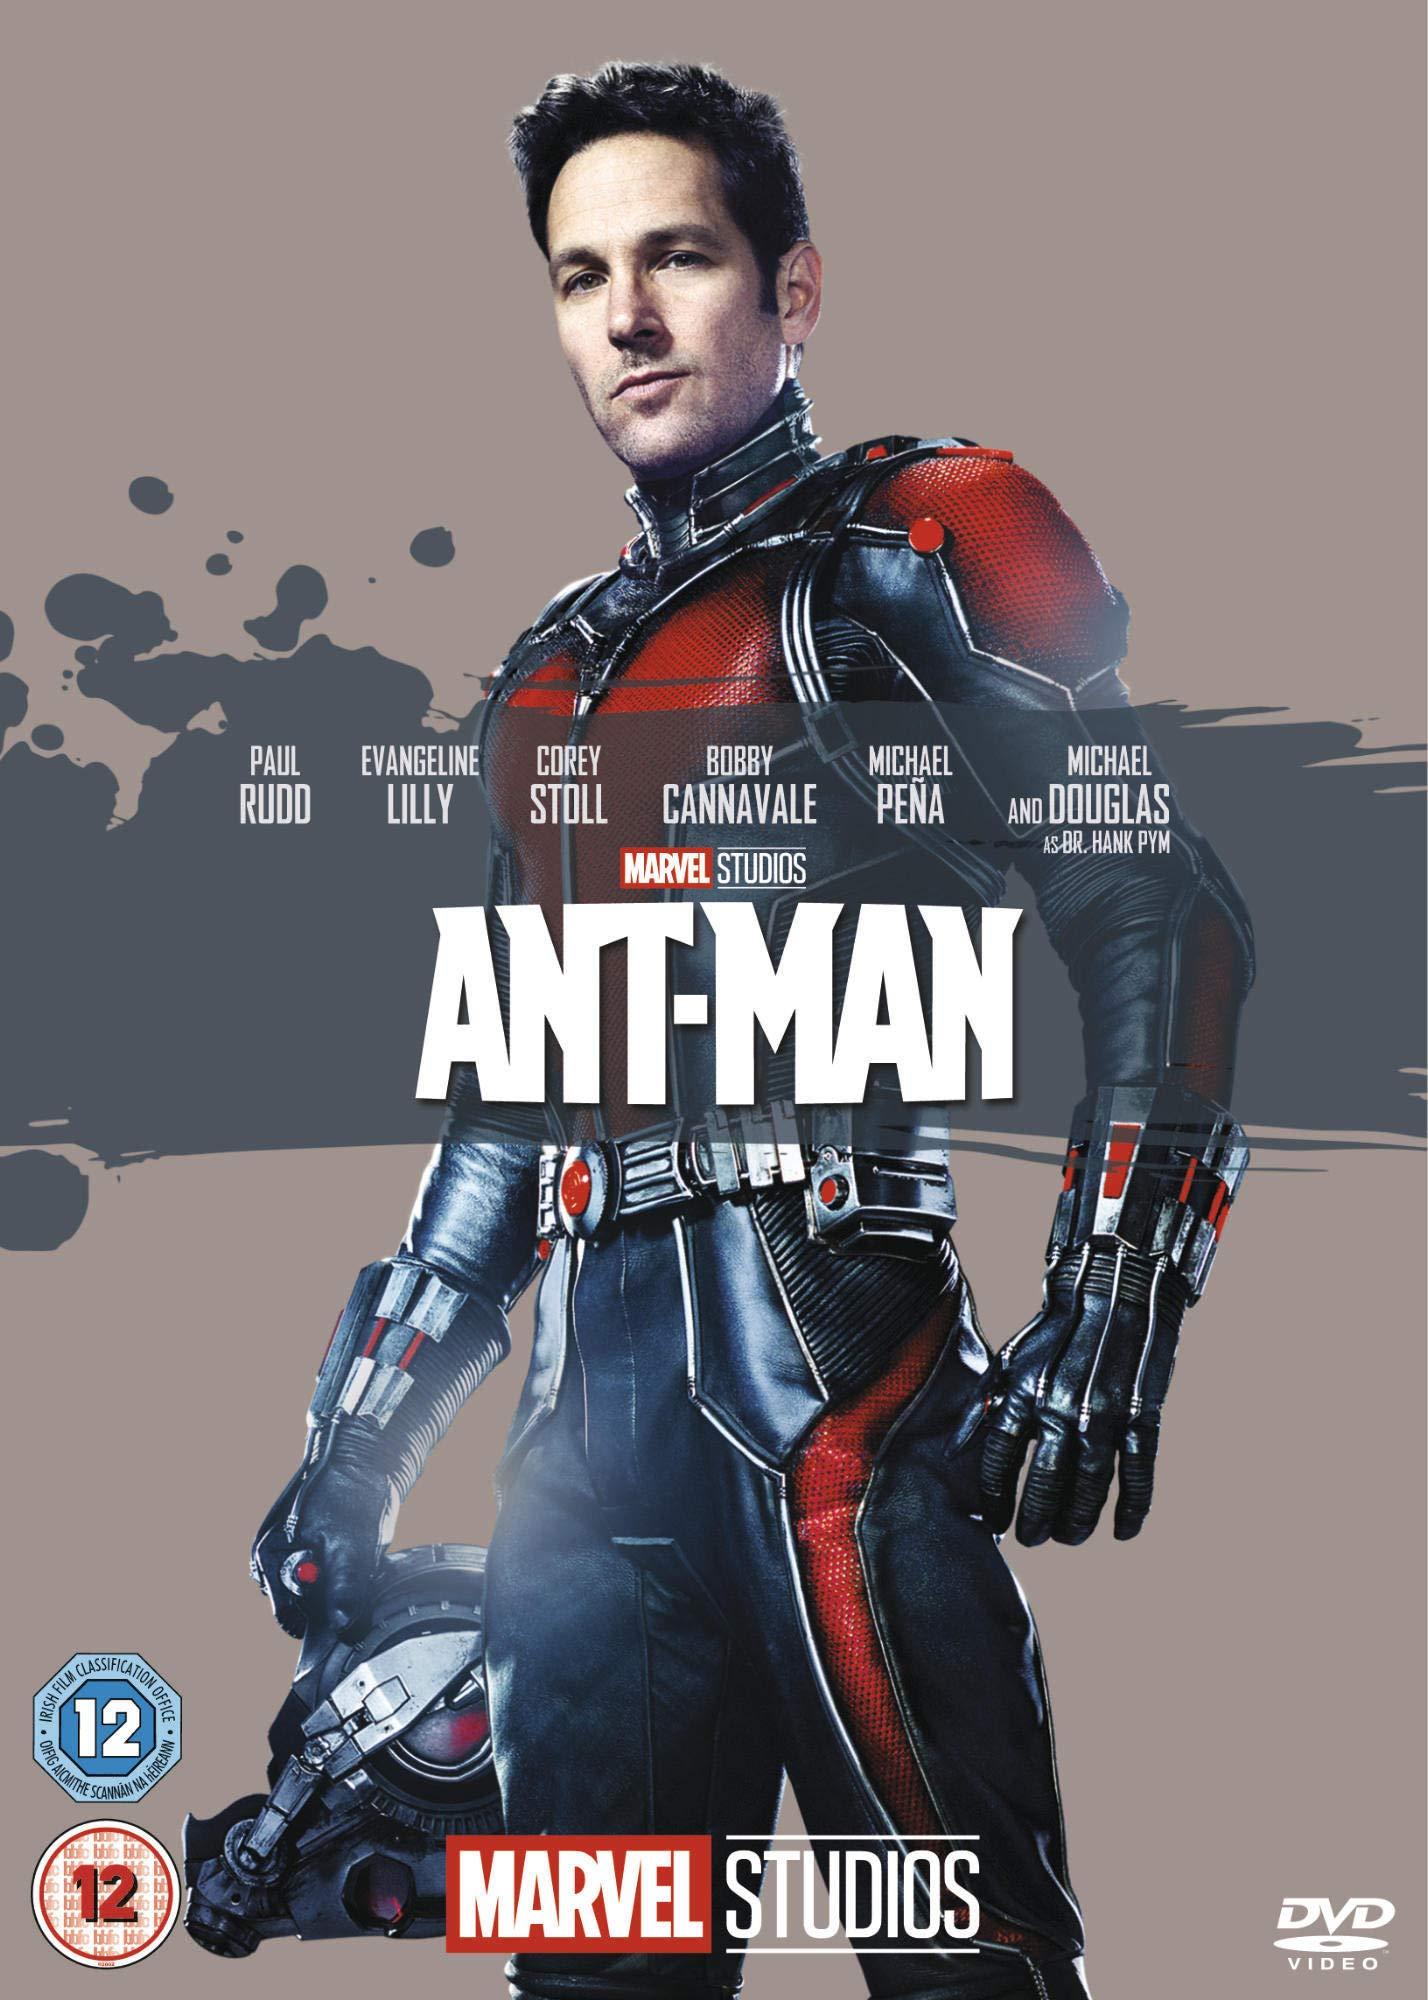 Marvel Cinematic Universe film 12 - Ant-Man